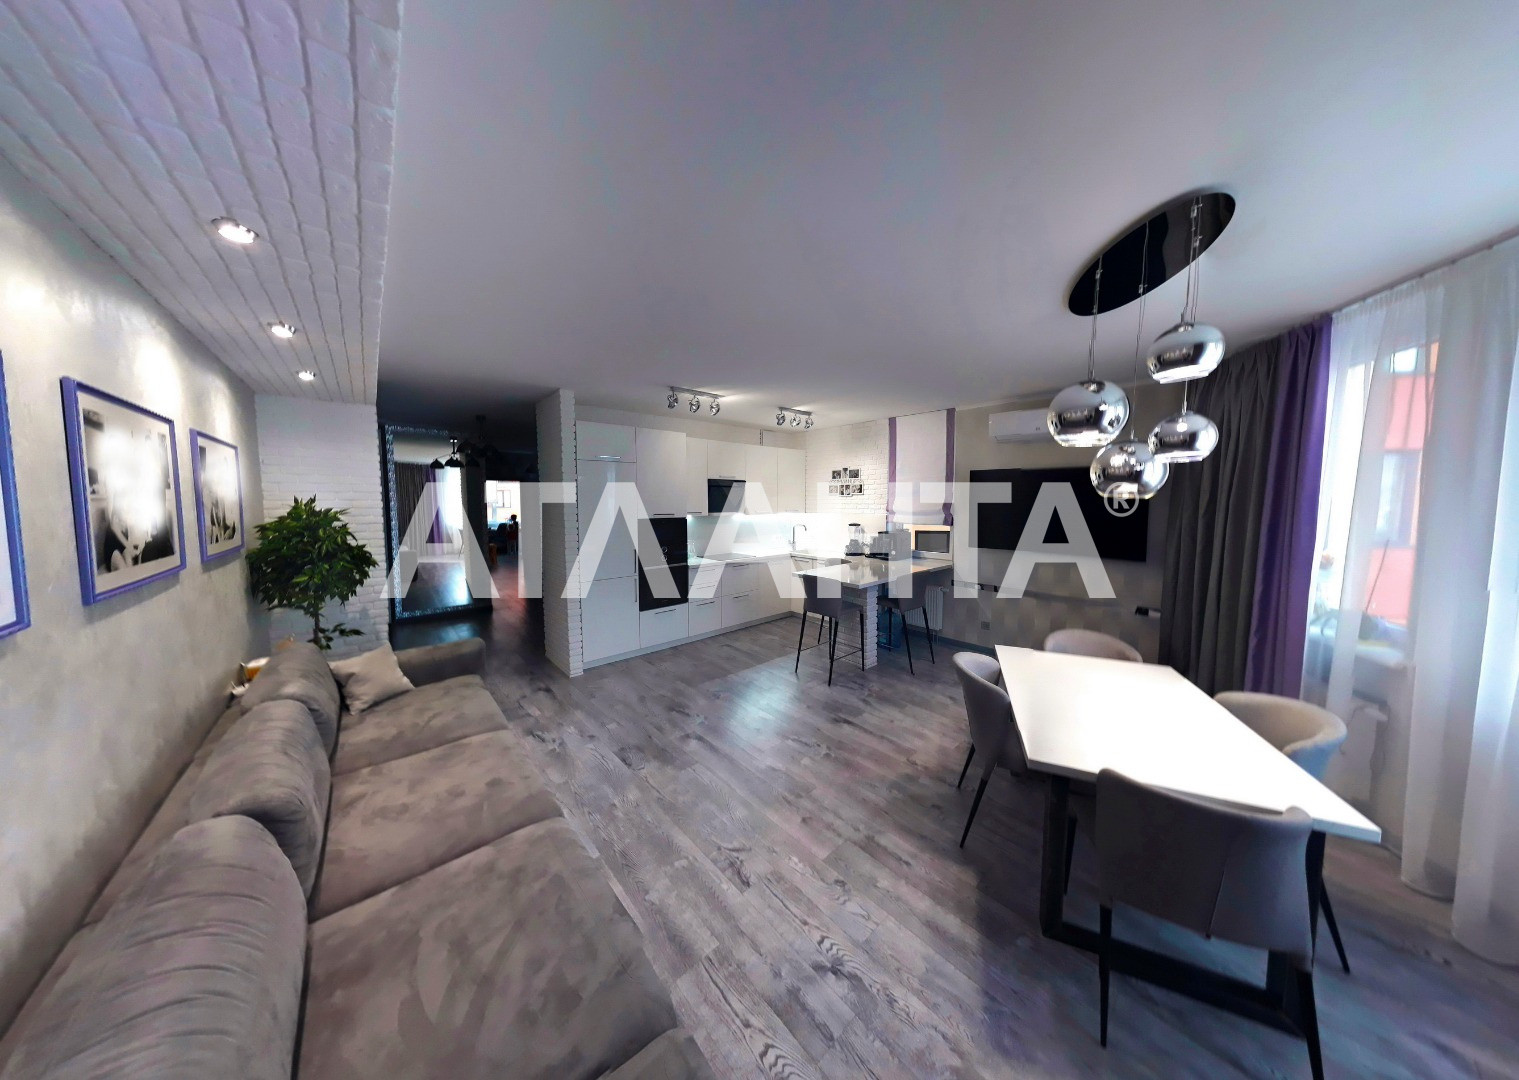 Продается 3-комнатная Квартира на ул. Ул. Ломоносова  — 220 000 у.е. (фото №3)